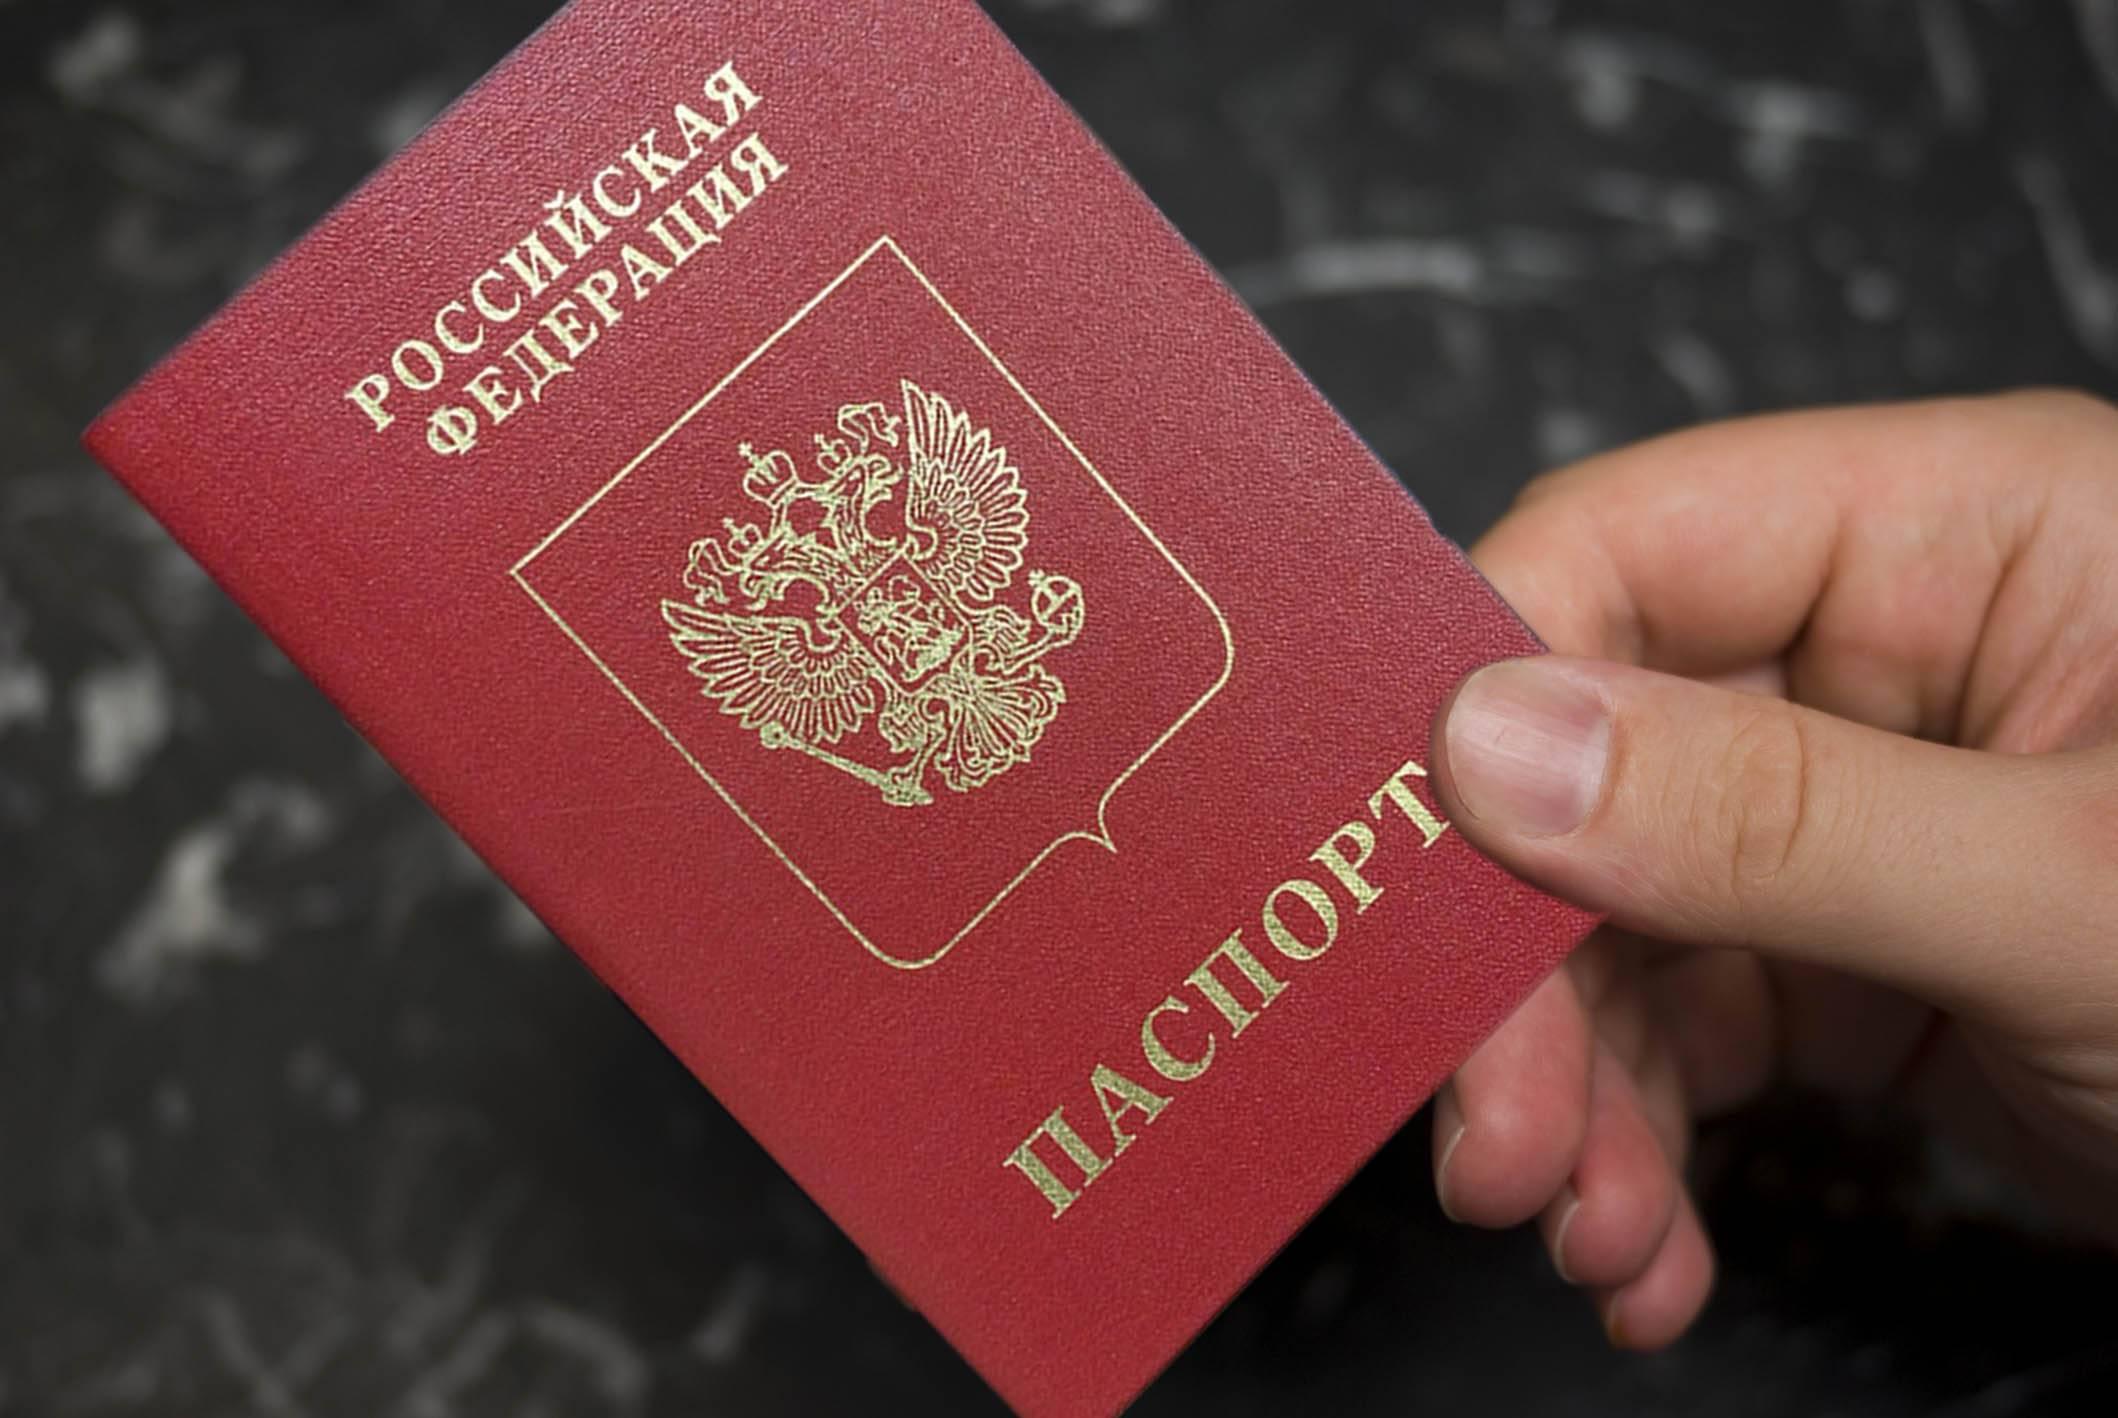 Проверить паспорт на сайте фмс